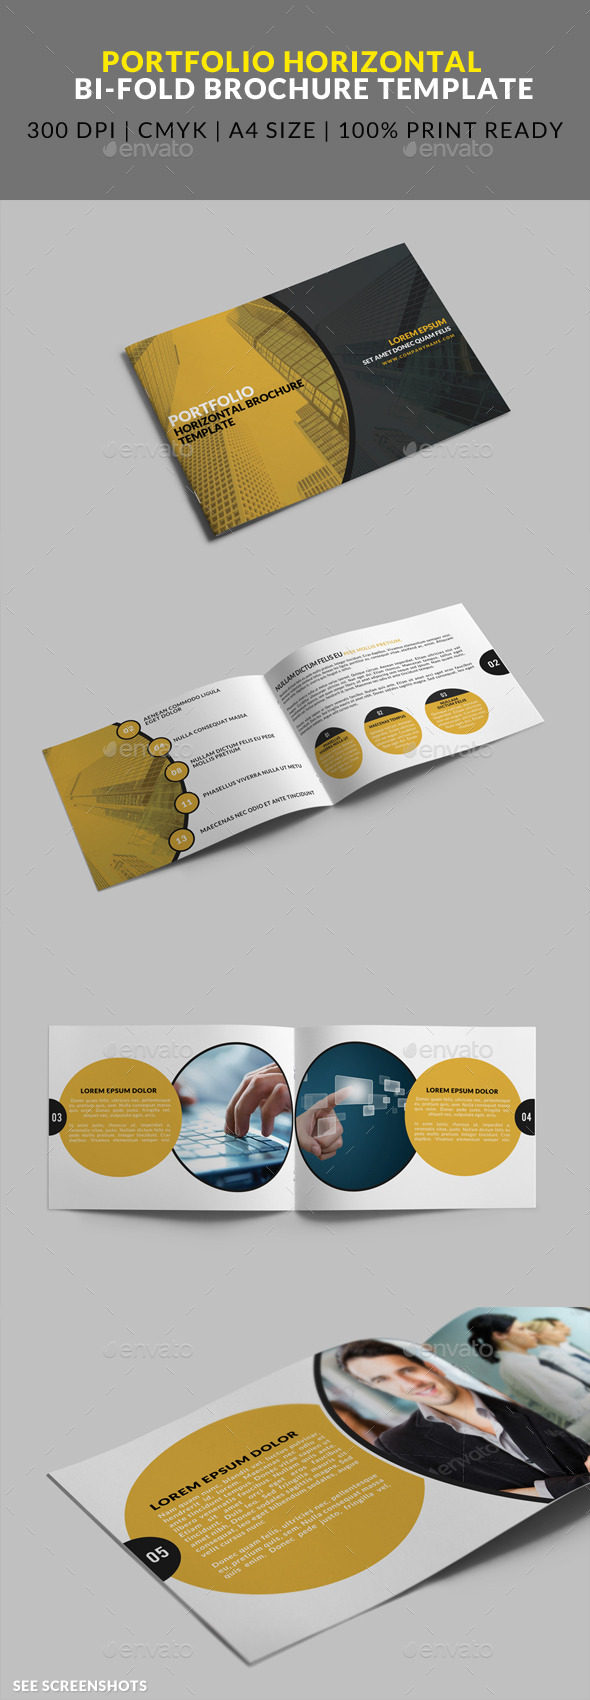 GraphicRiver 8 Page Portfolio Horizontal Bifold Brochure 8823869